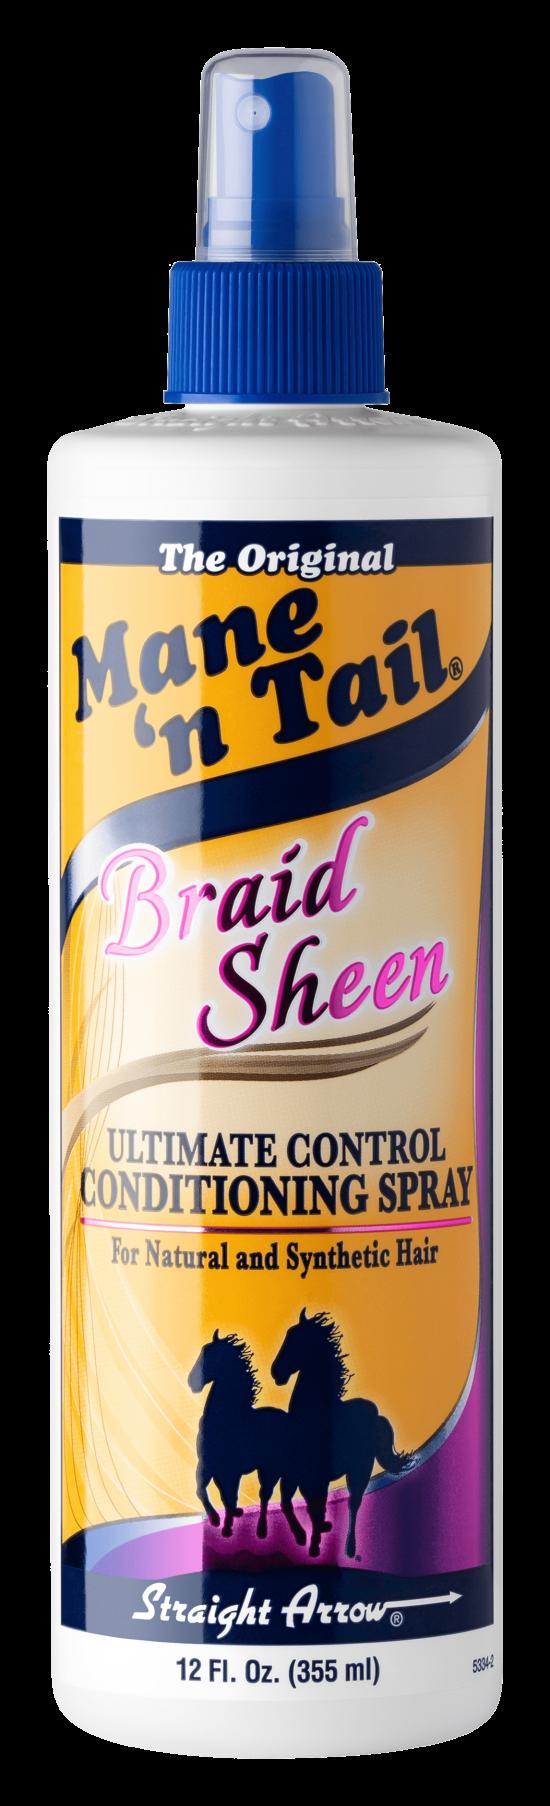 Braid Sheen 12 oz spray bottle